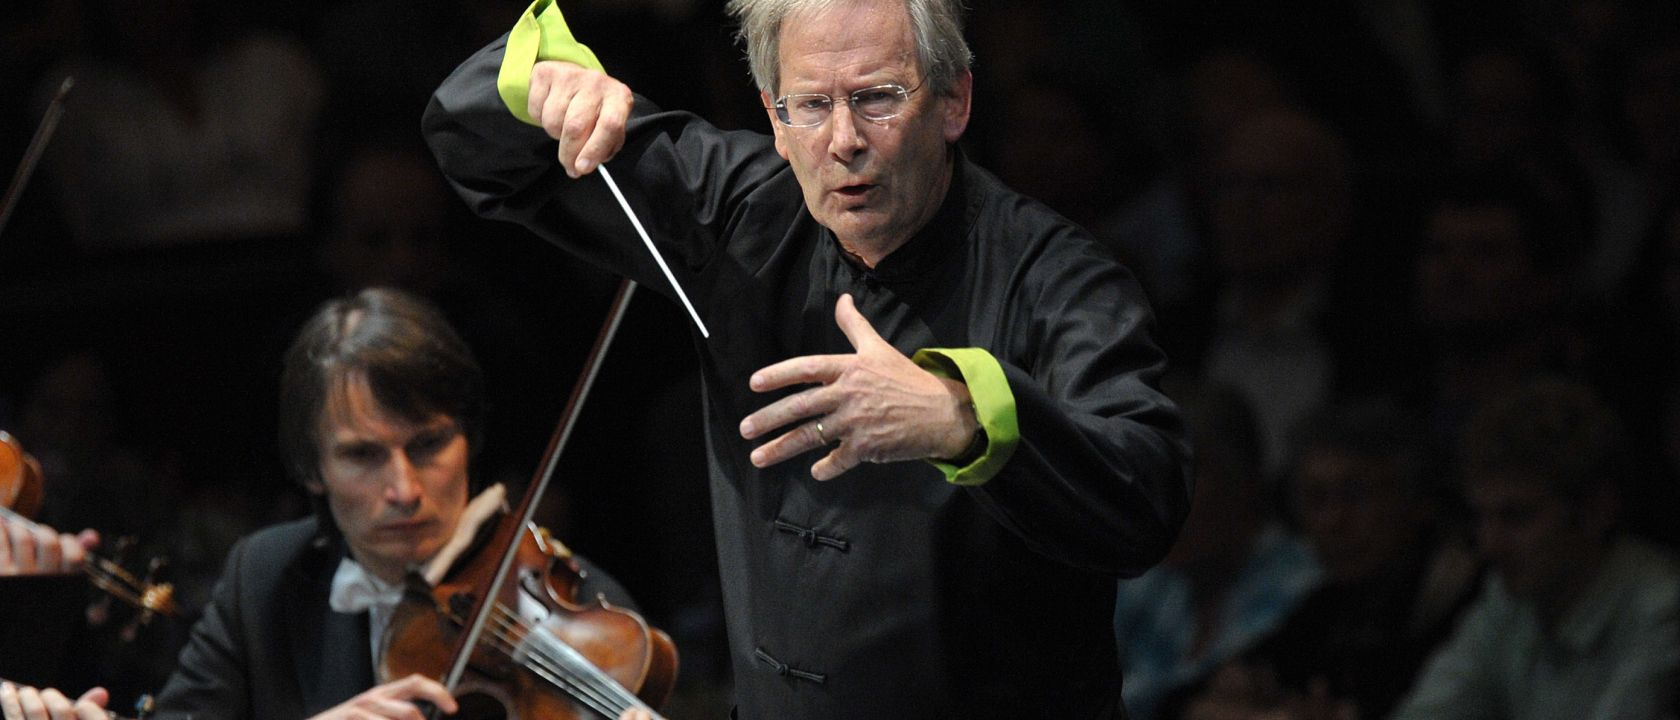 Conductor John Eliot Gardiner